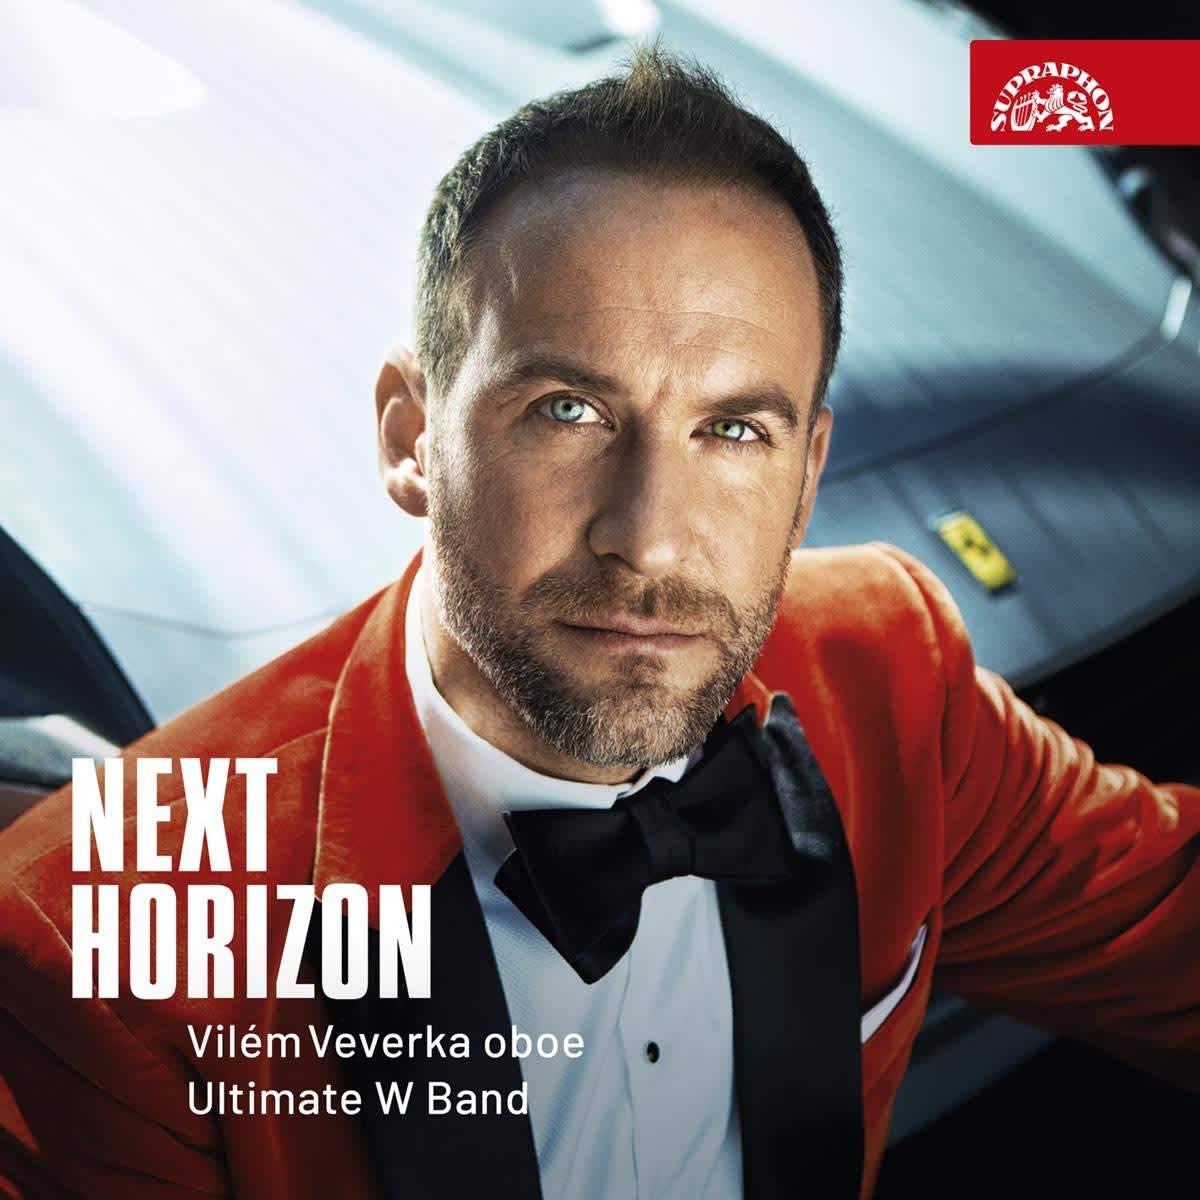 Photo No.1 of Next Horizon - Vilém Veverka (Oboe) & Ultimate W Band